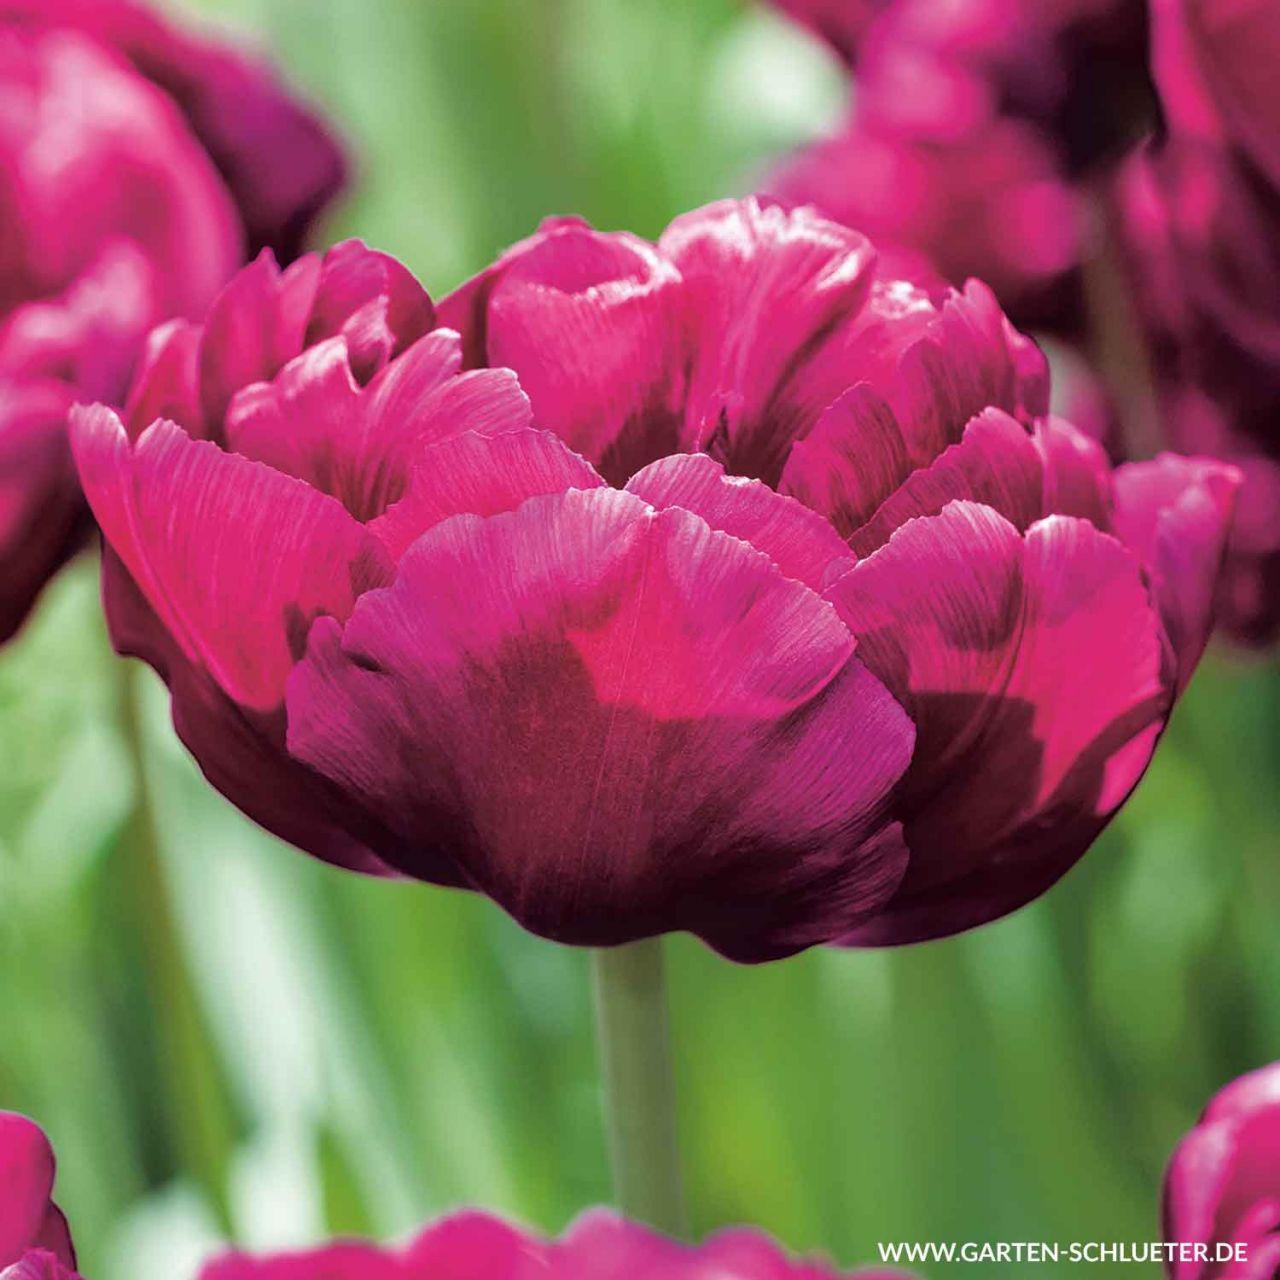 Garten-Schlueter.de: Gefüllte frühe Tulpe Showcase - 7 Stück